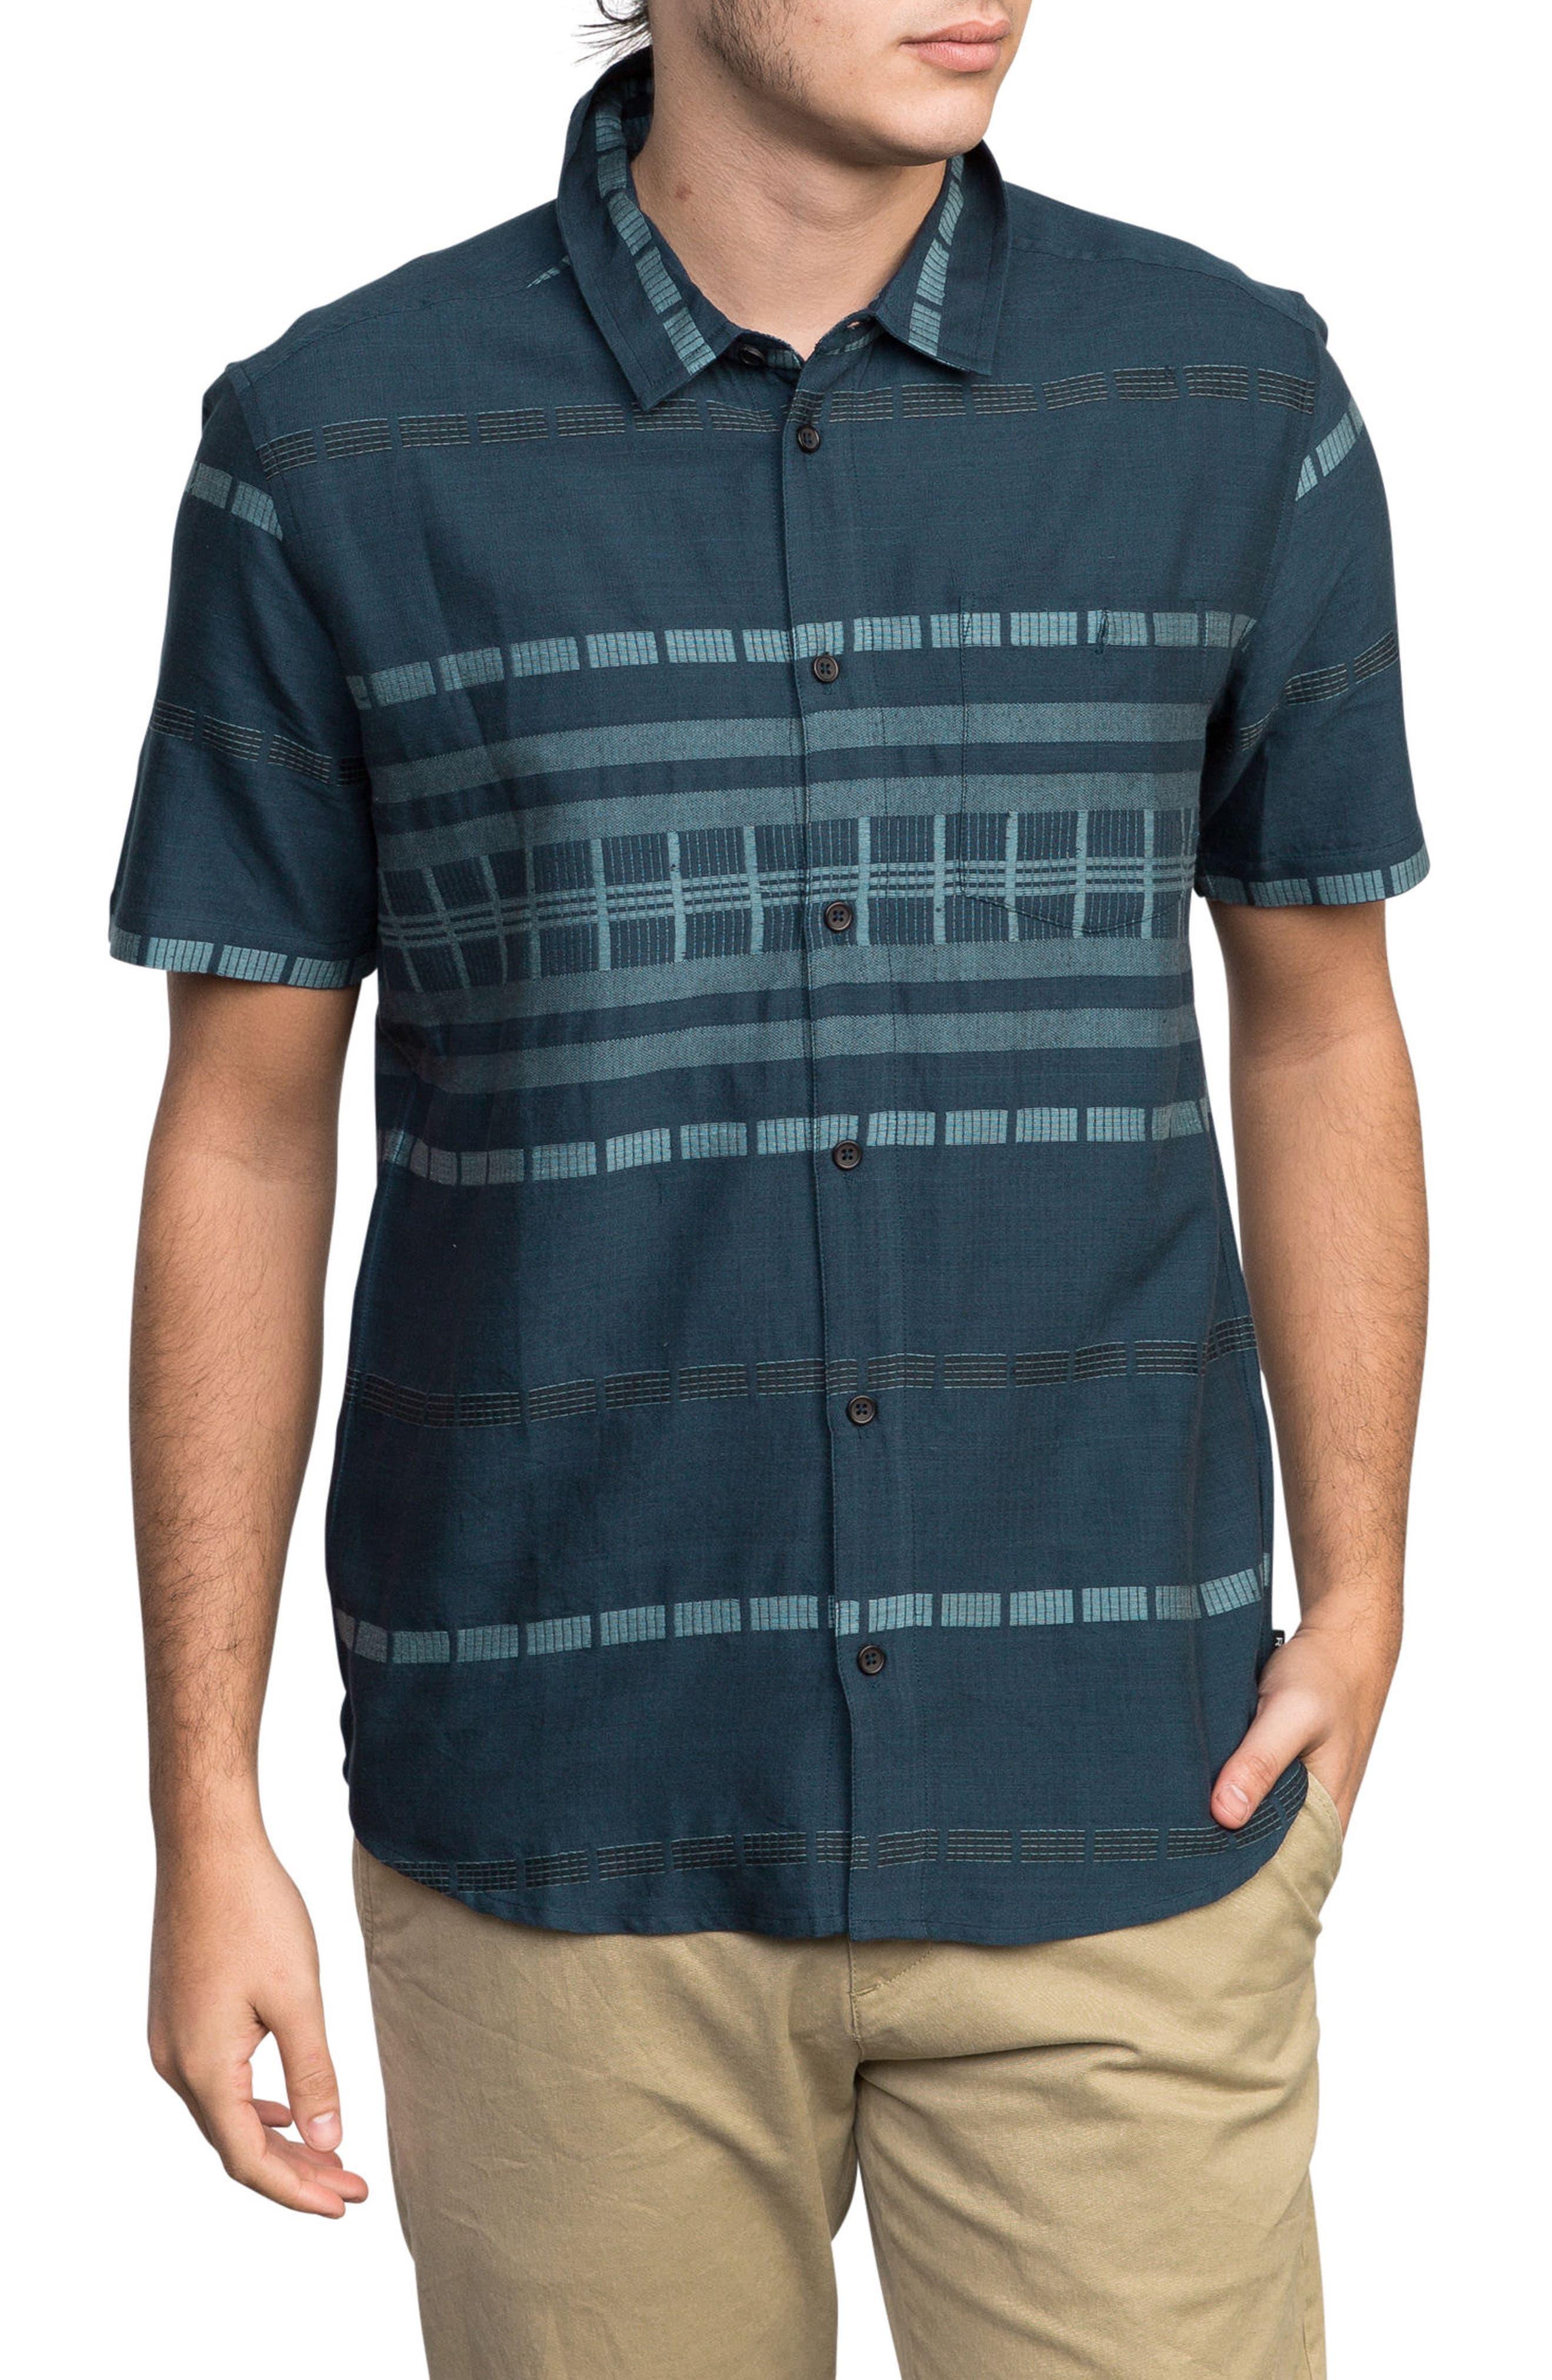 RVCA,                             Krazy Kat Woven Shirt,                             Main thumbnail 1, color,                             415